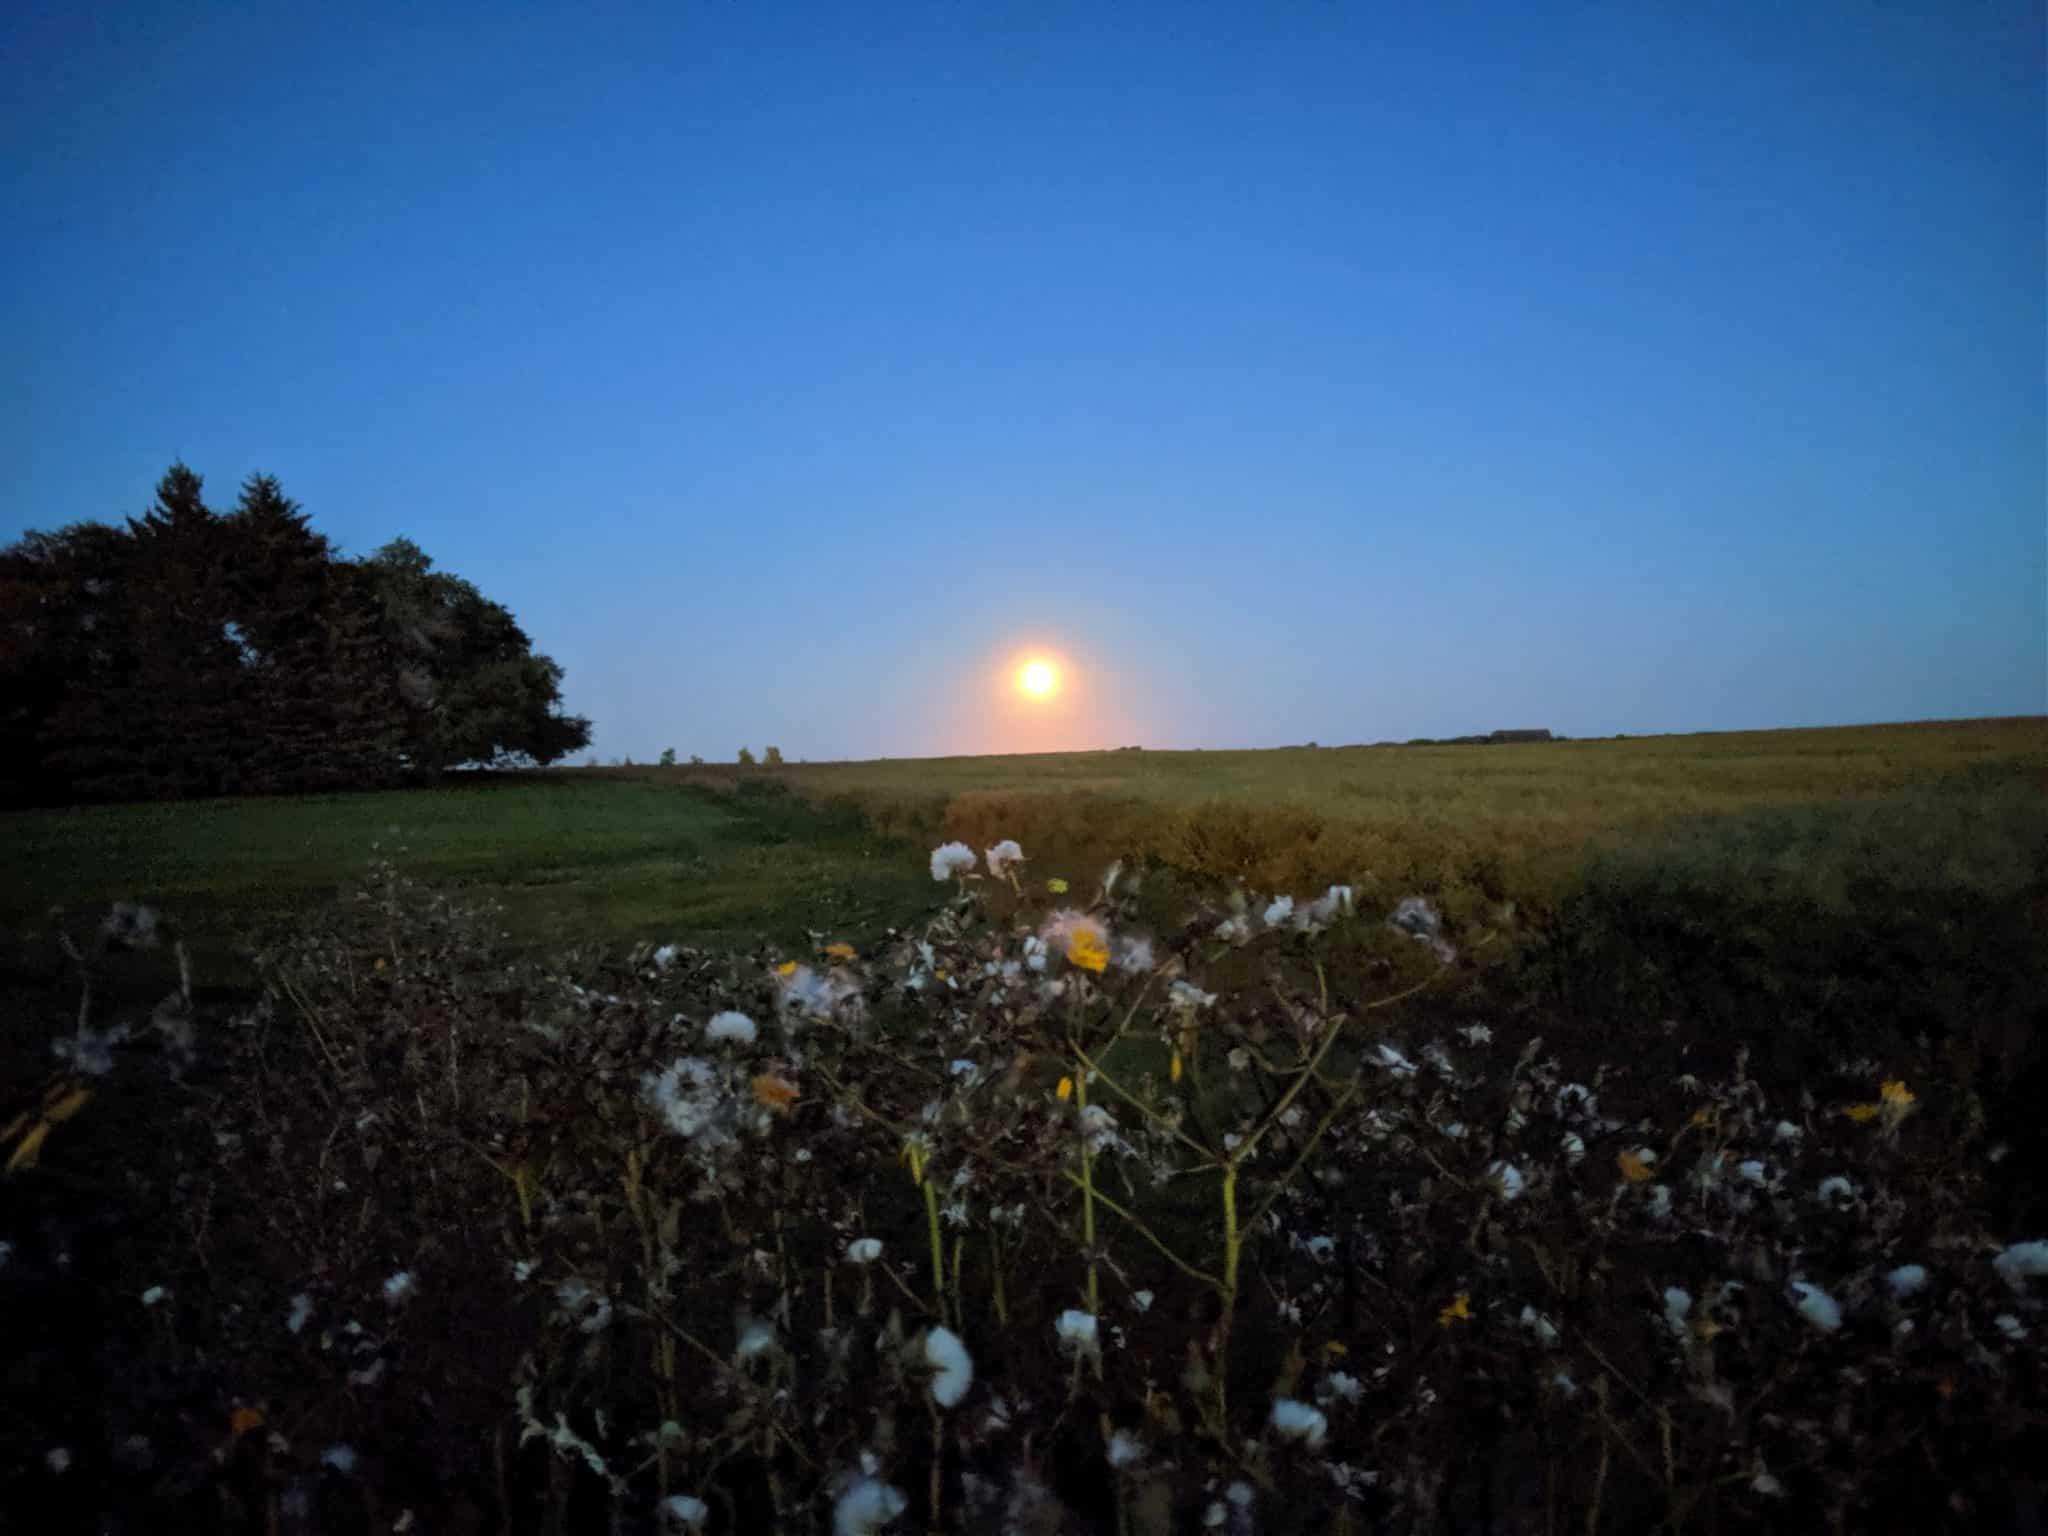 Season of Seva - Support Your Local Farmer